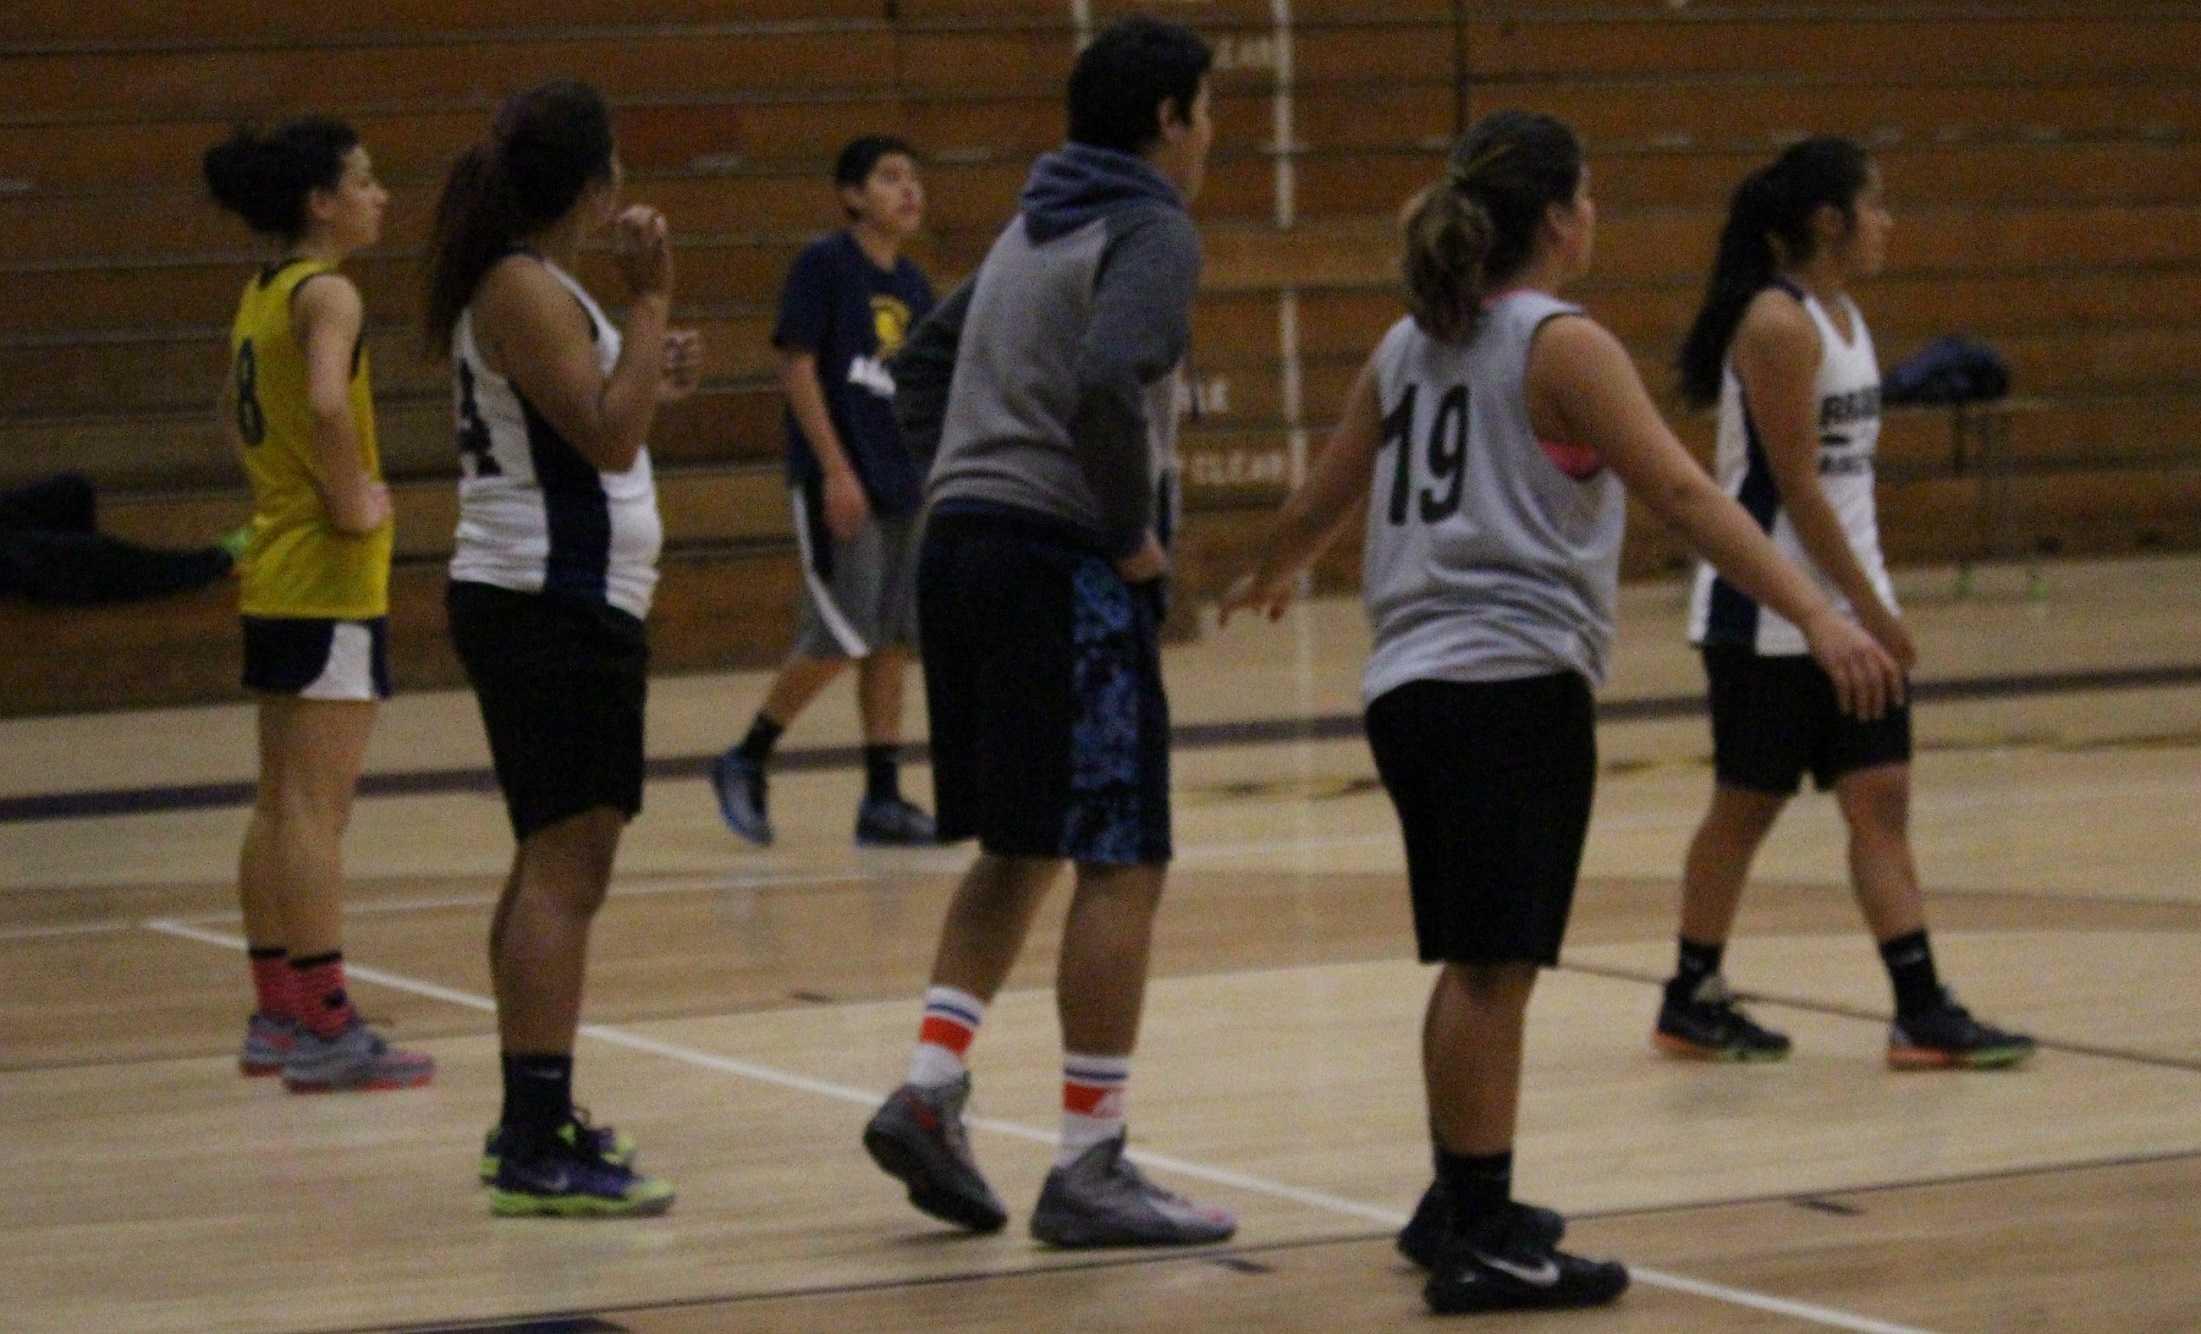 (Starting front right counterclockwise) Maggie Garcia (10), Janeth Cruz ( 11), Adriana Penate (12), Joyceline Jose (10)